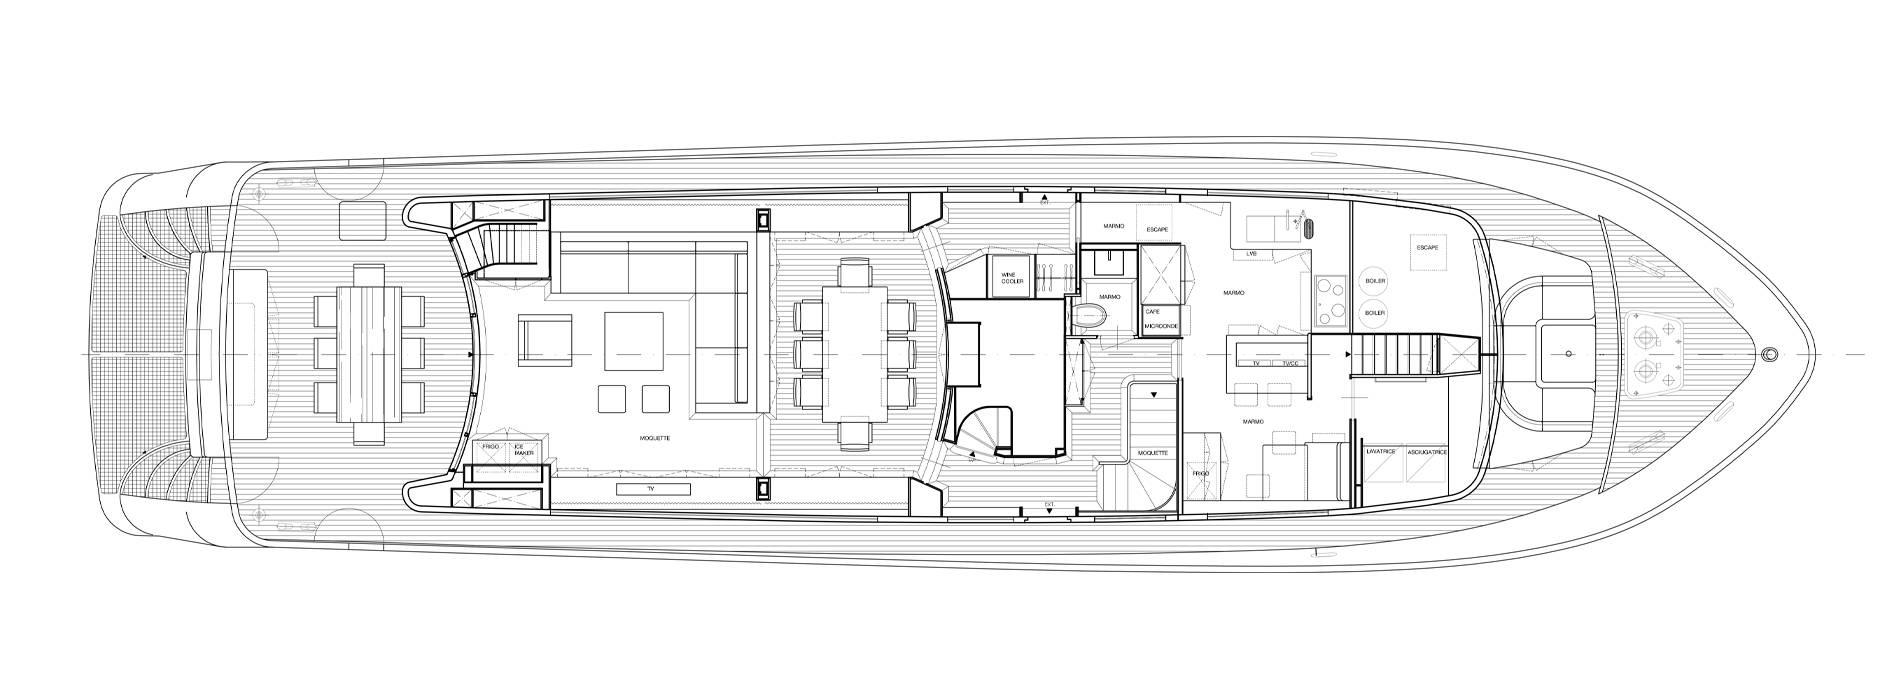 Sanlorenzo Yachts SL88-541 Главная палуба